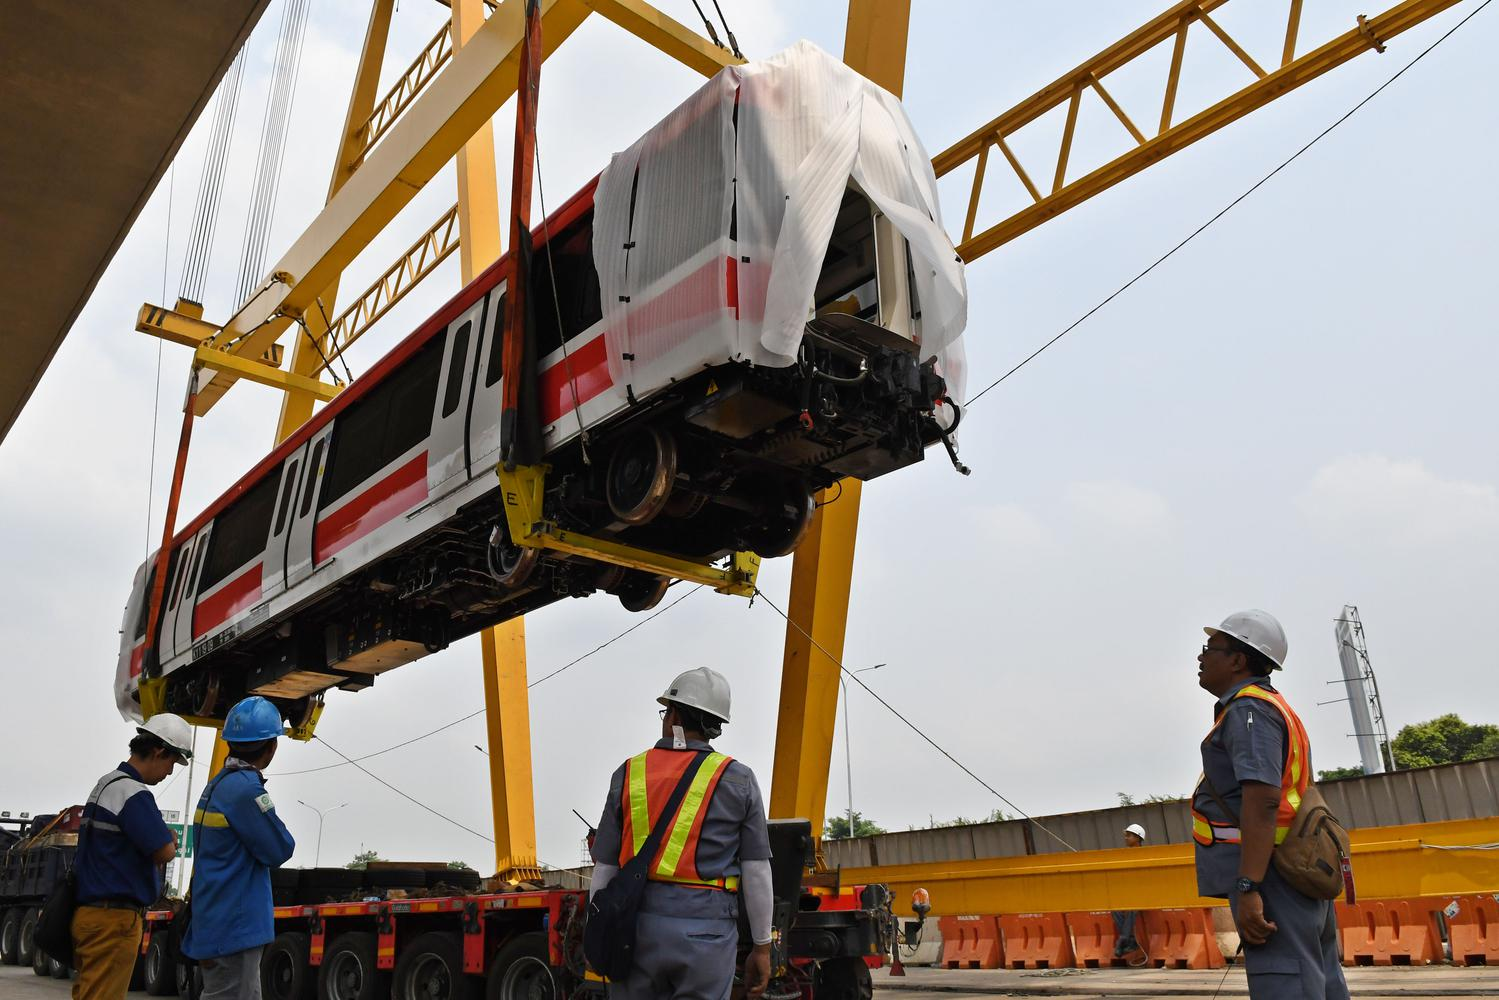 Sejumlah petugas mengawasi proses pengangkatan gerbong kereta 'light rail train' atau lintas rel terpadu (LRT) ke atas rel di Stasiun Harjamukti, Cimanggis, Kota Depok, Jawa Barat, Rabu (4/12/2019).